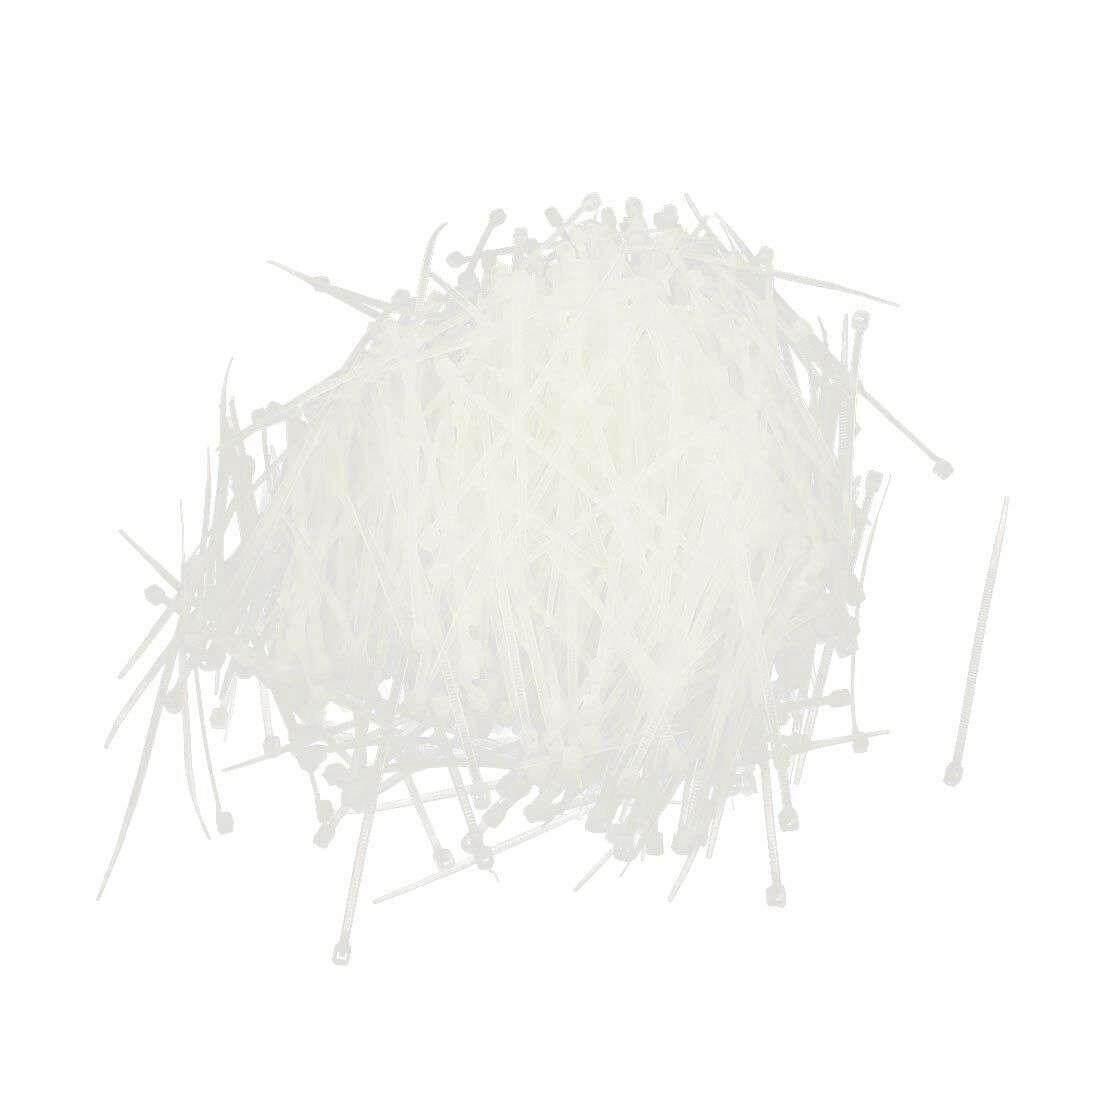 1000pcs 3.2inch inch Length White Cord Wire Strap Nylon Cable Tie